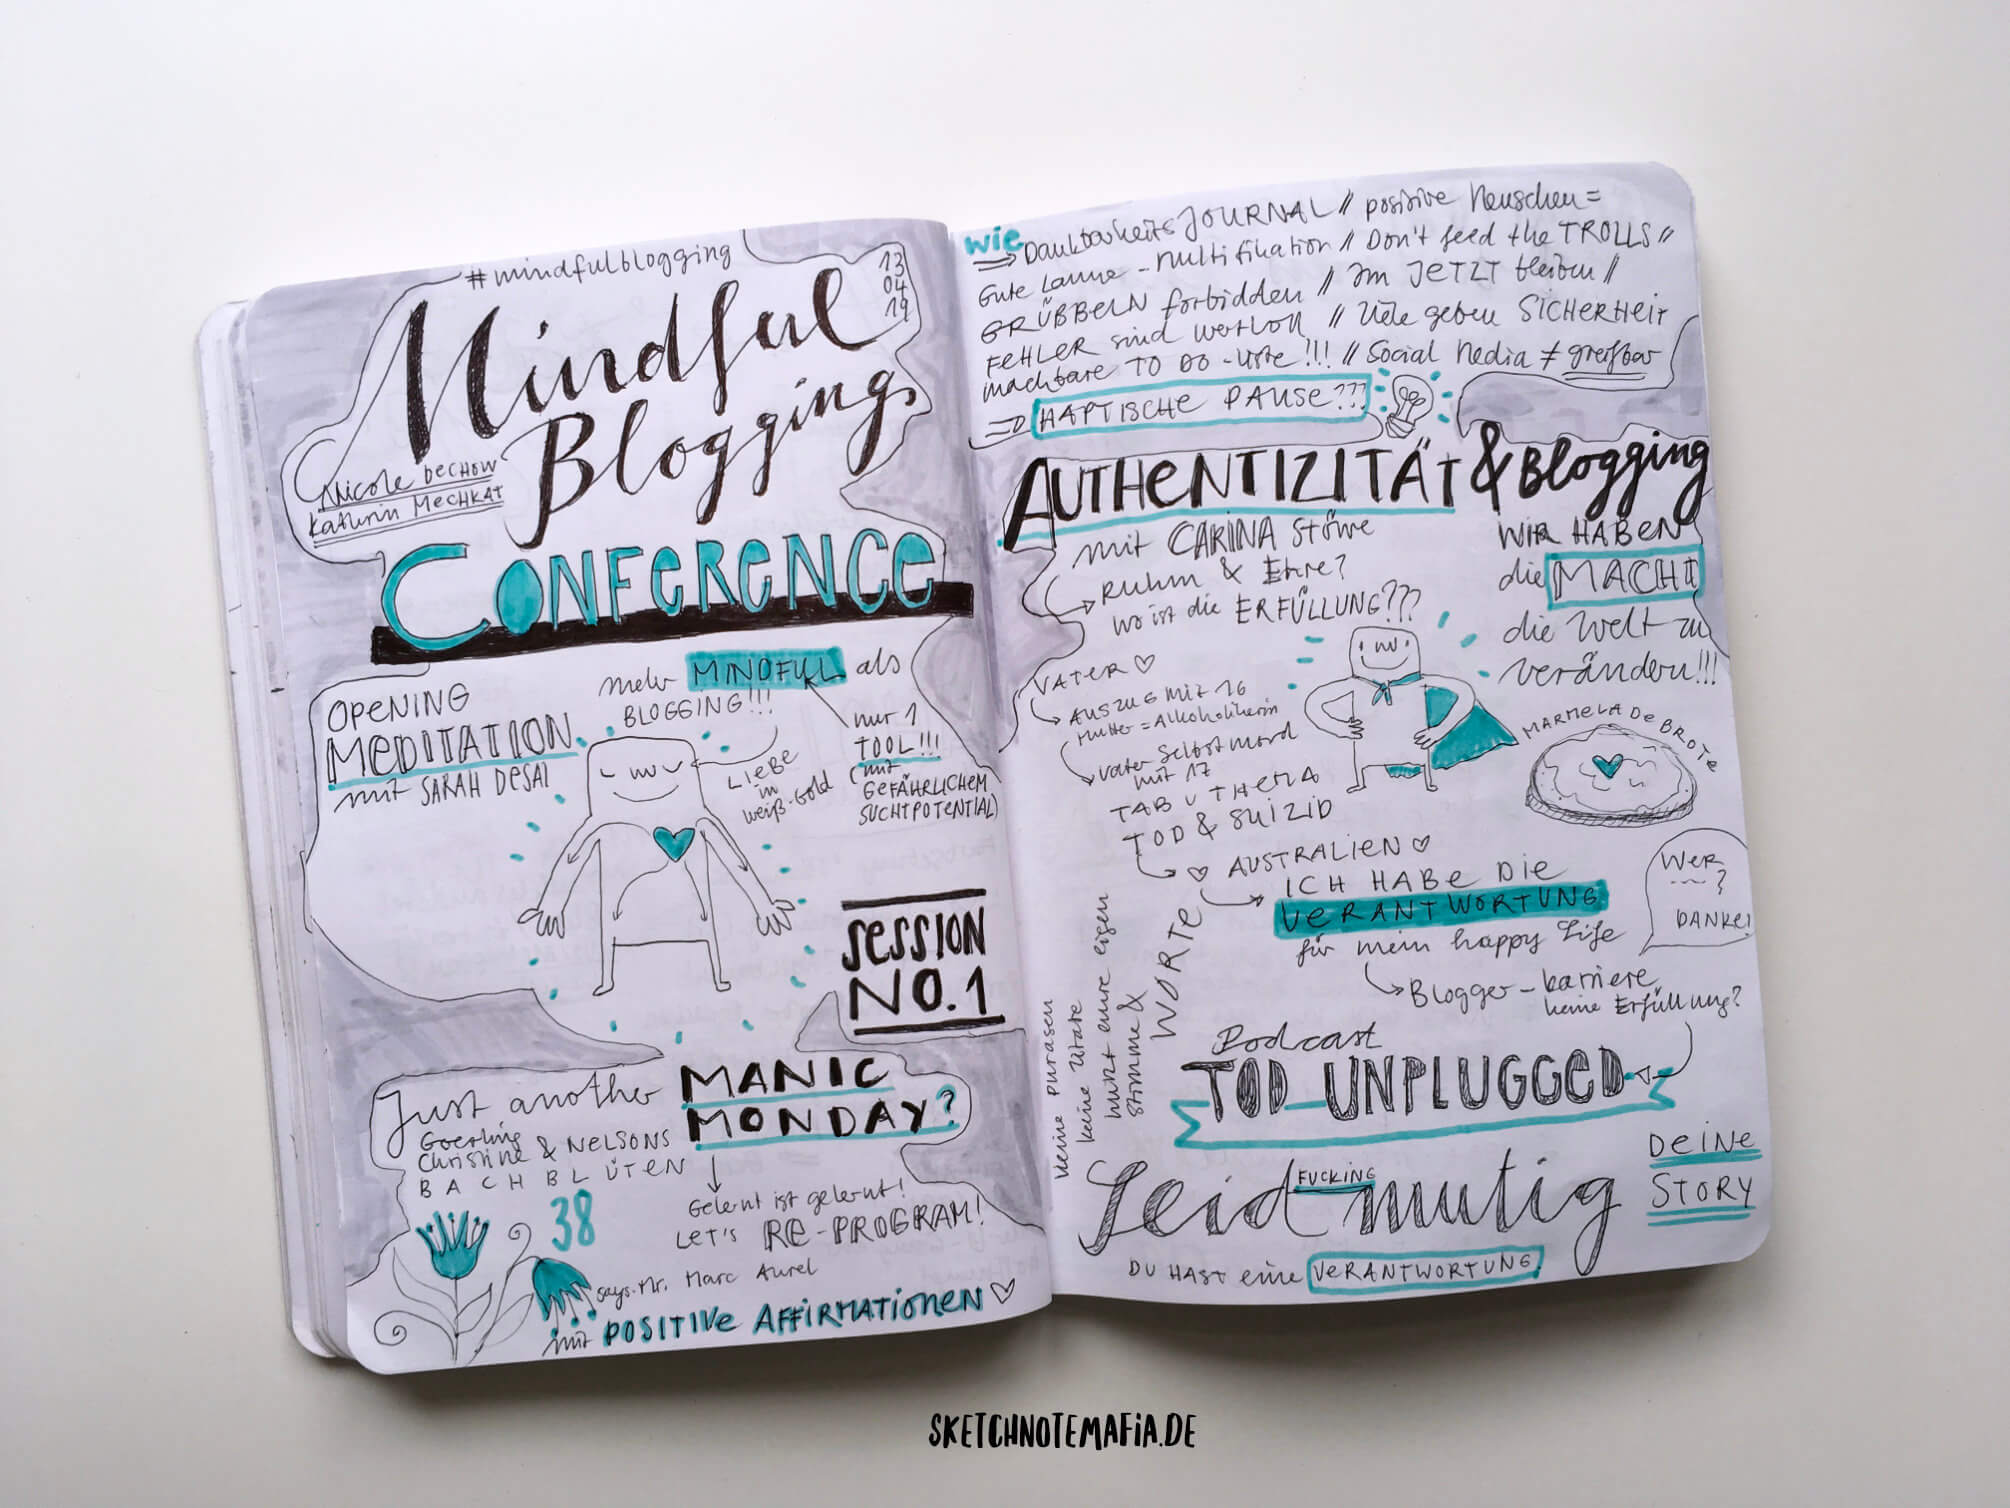 Mindful Blogging Conference - Authentizität